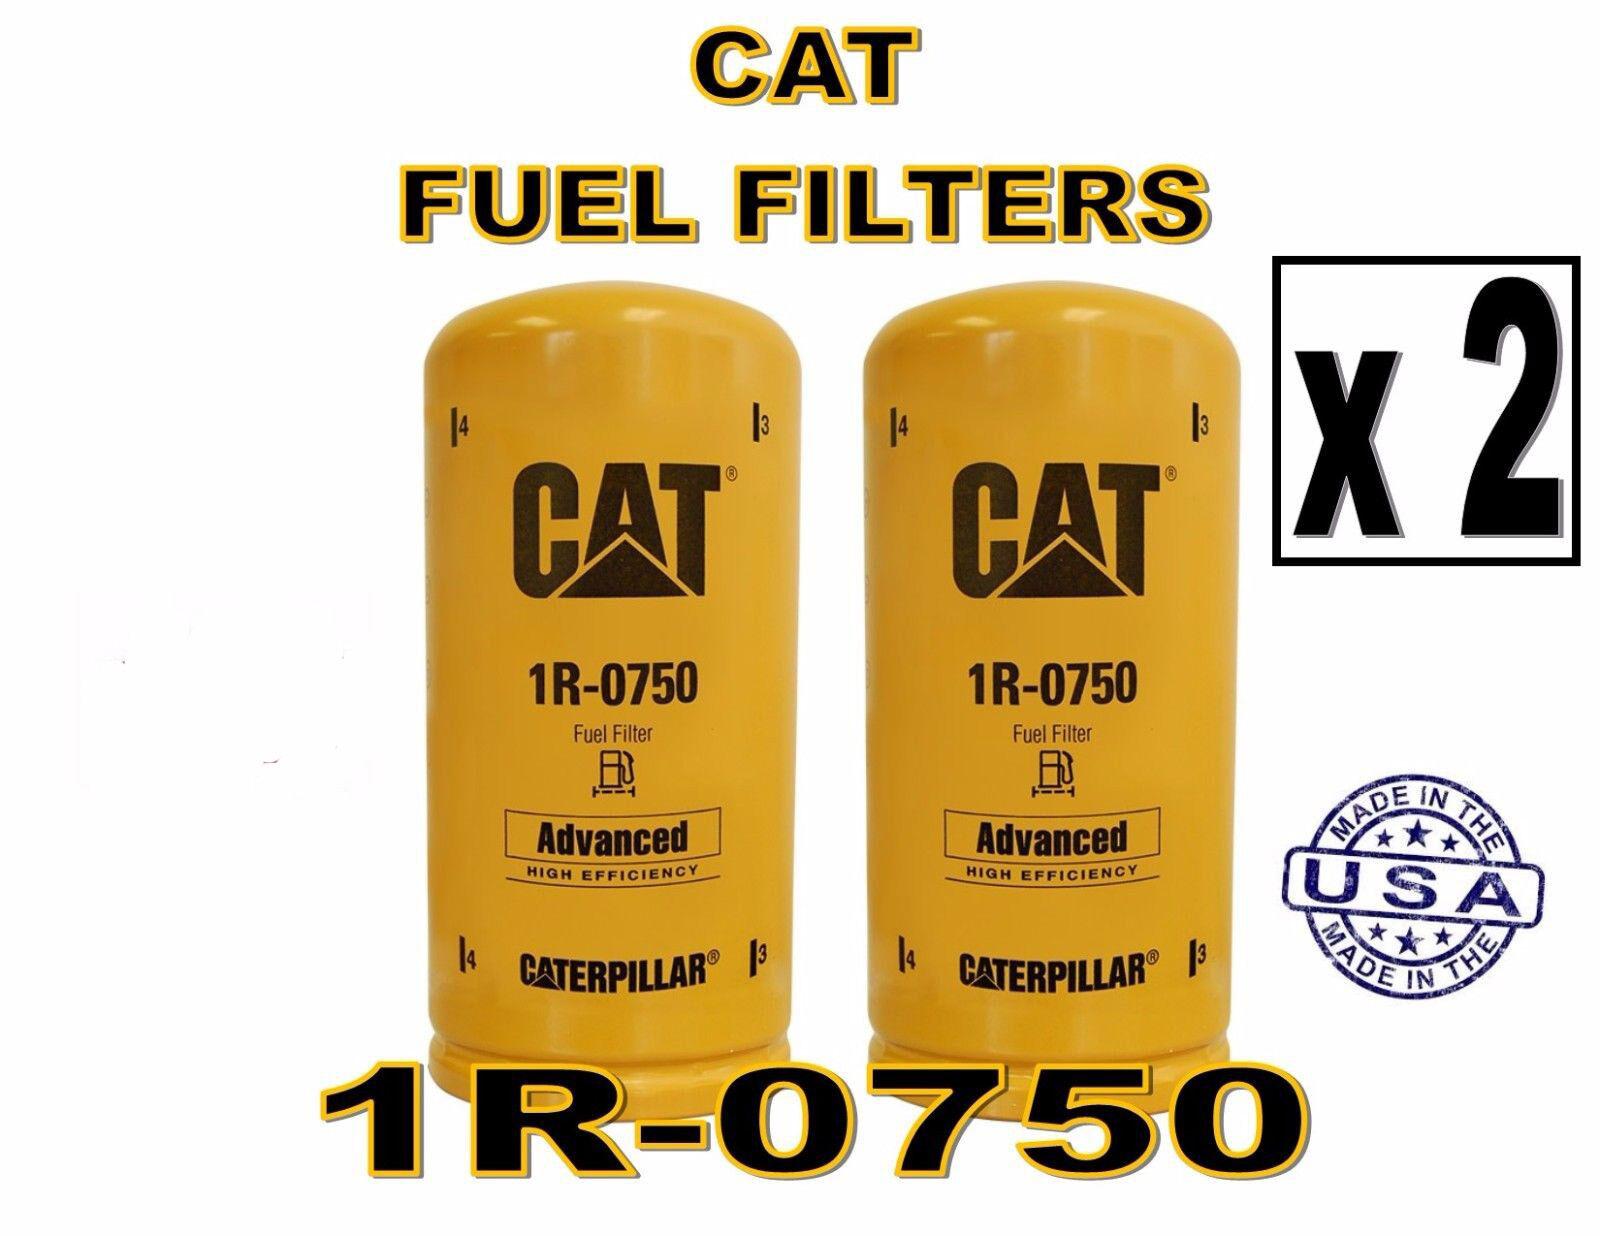 Caterpillar. Fuel Filters